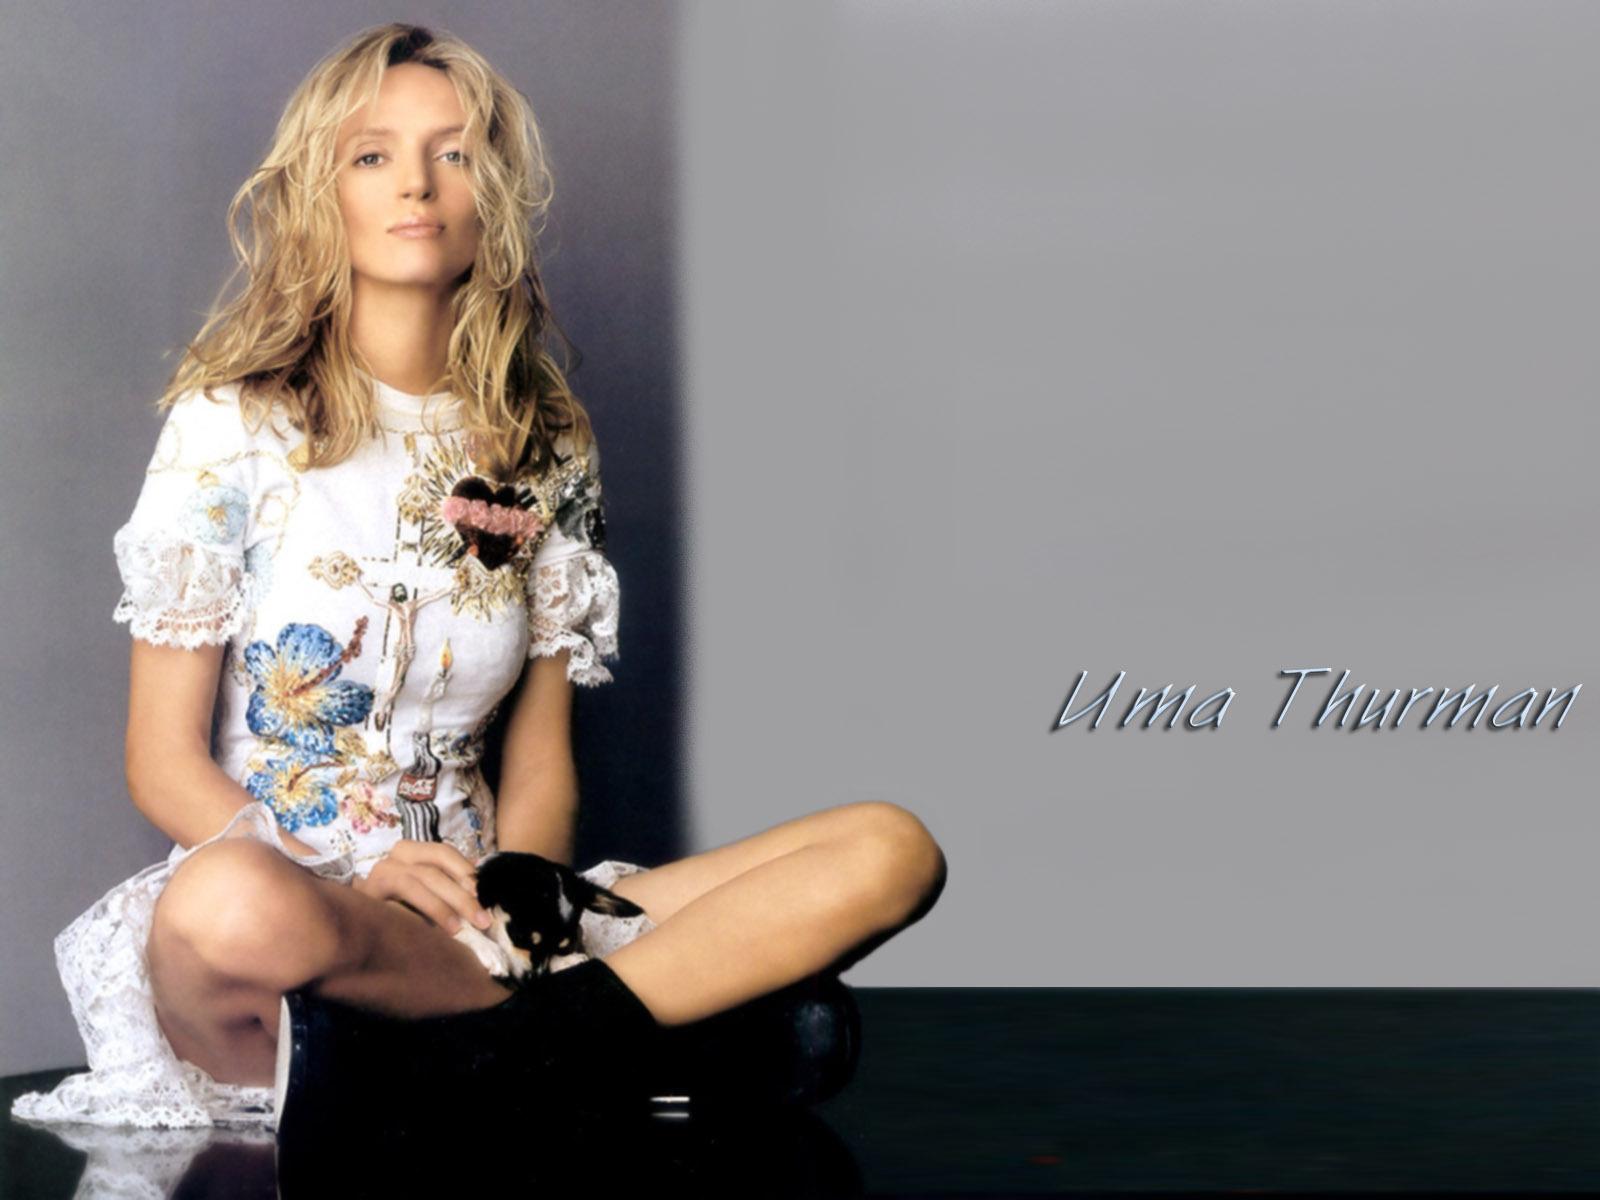 Uma Thurman - Uma Thurman Wallpaper (20732390) - Fanpop Uma Thurman About